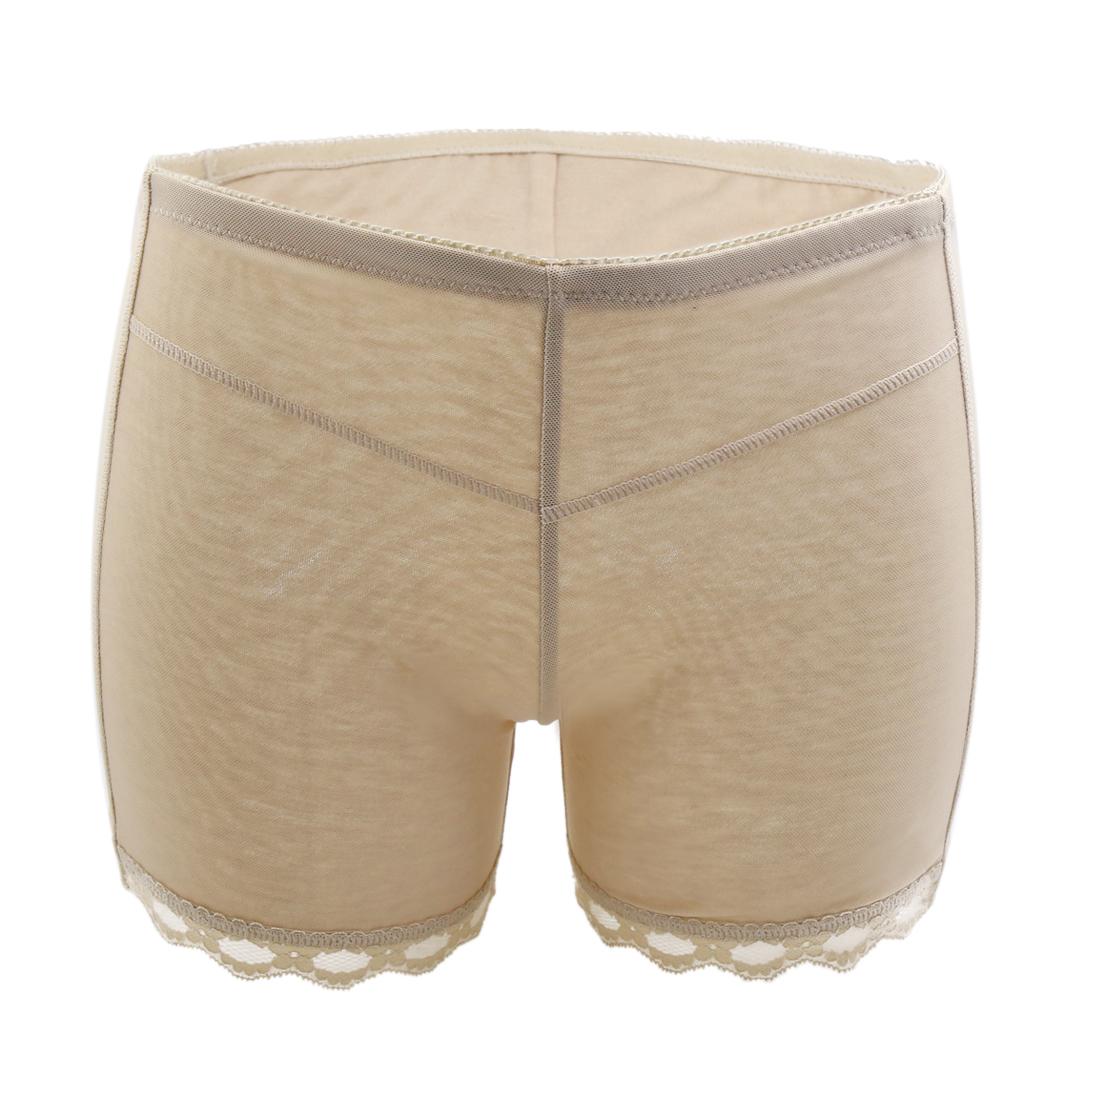 Size L Beige Lace Trim Hip Push Up Shaper Panty Tummy Waist Control Shapewear